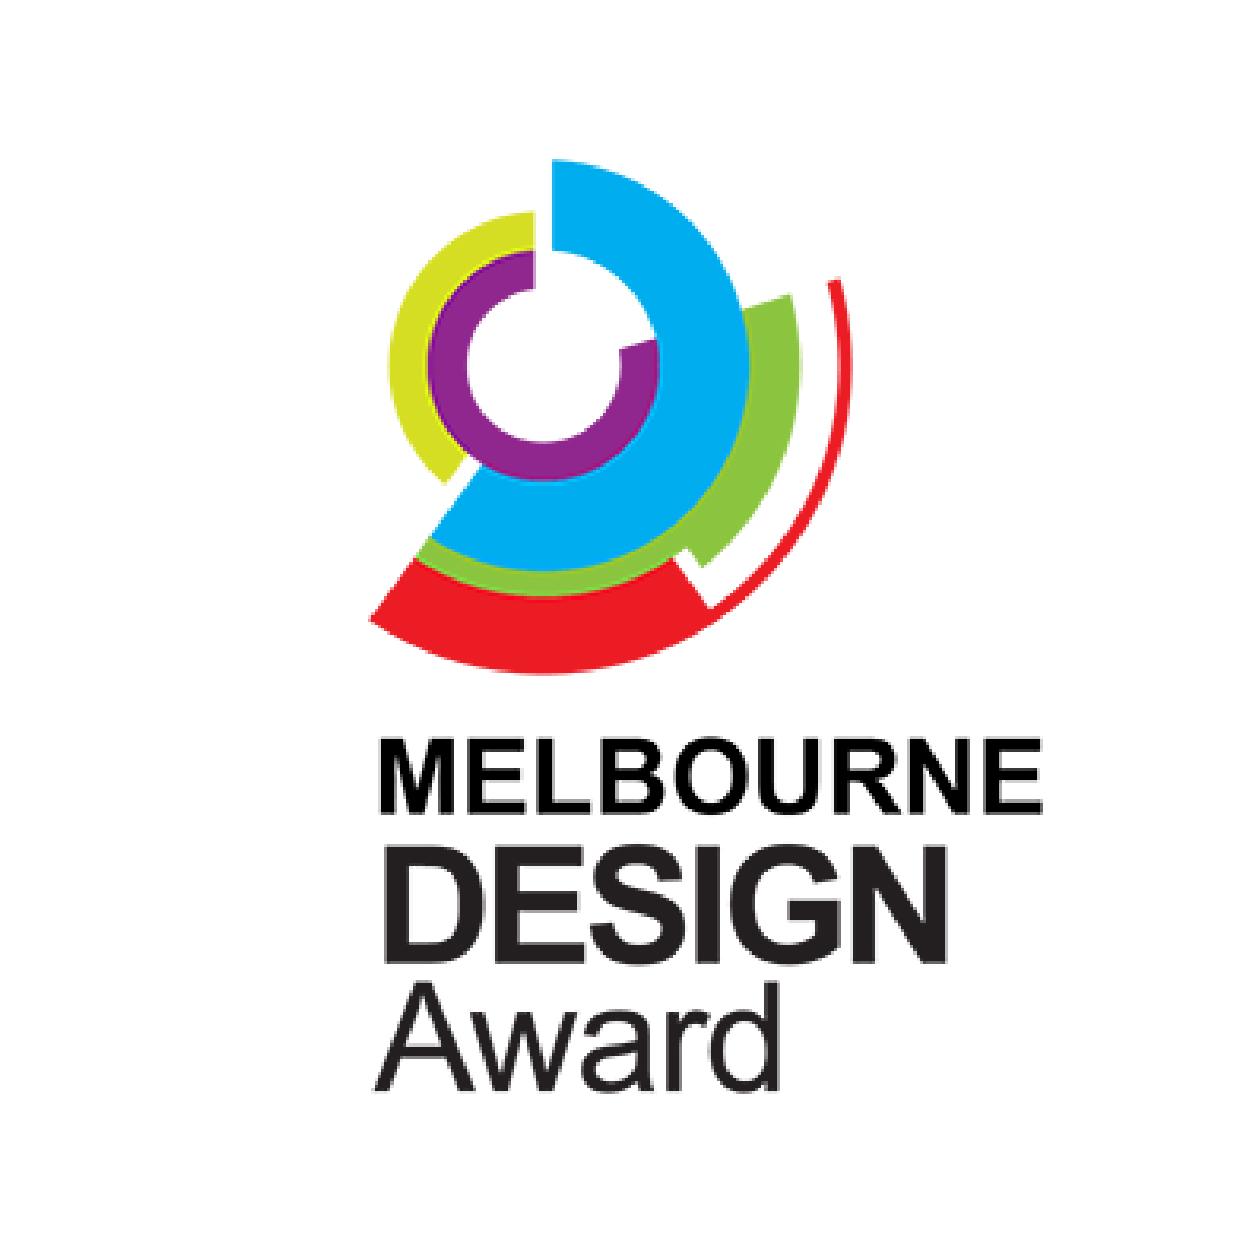 Melbourne Design Award